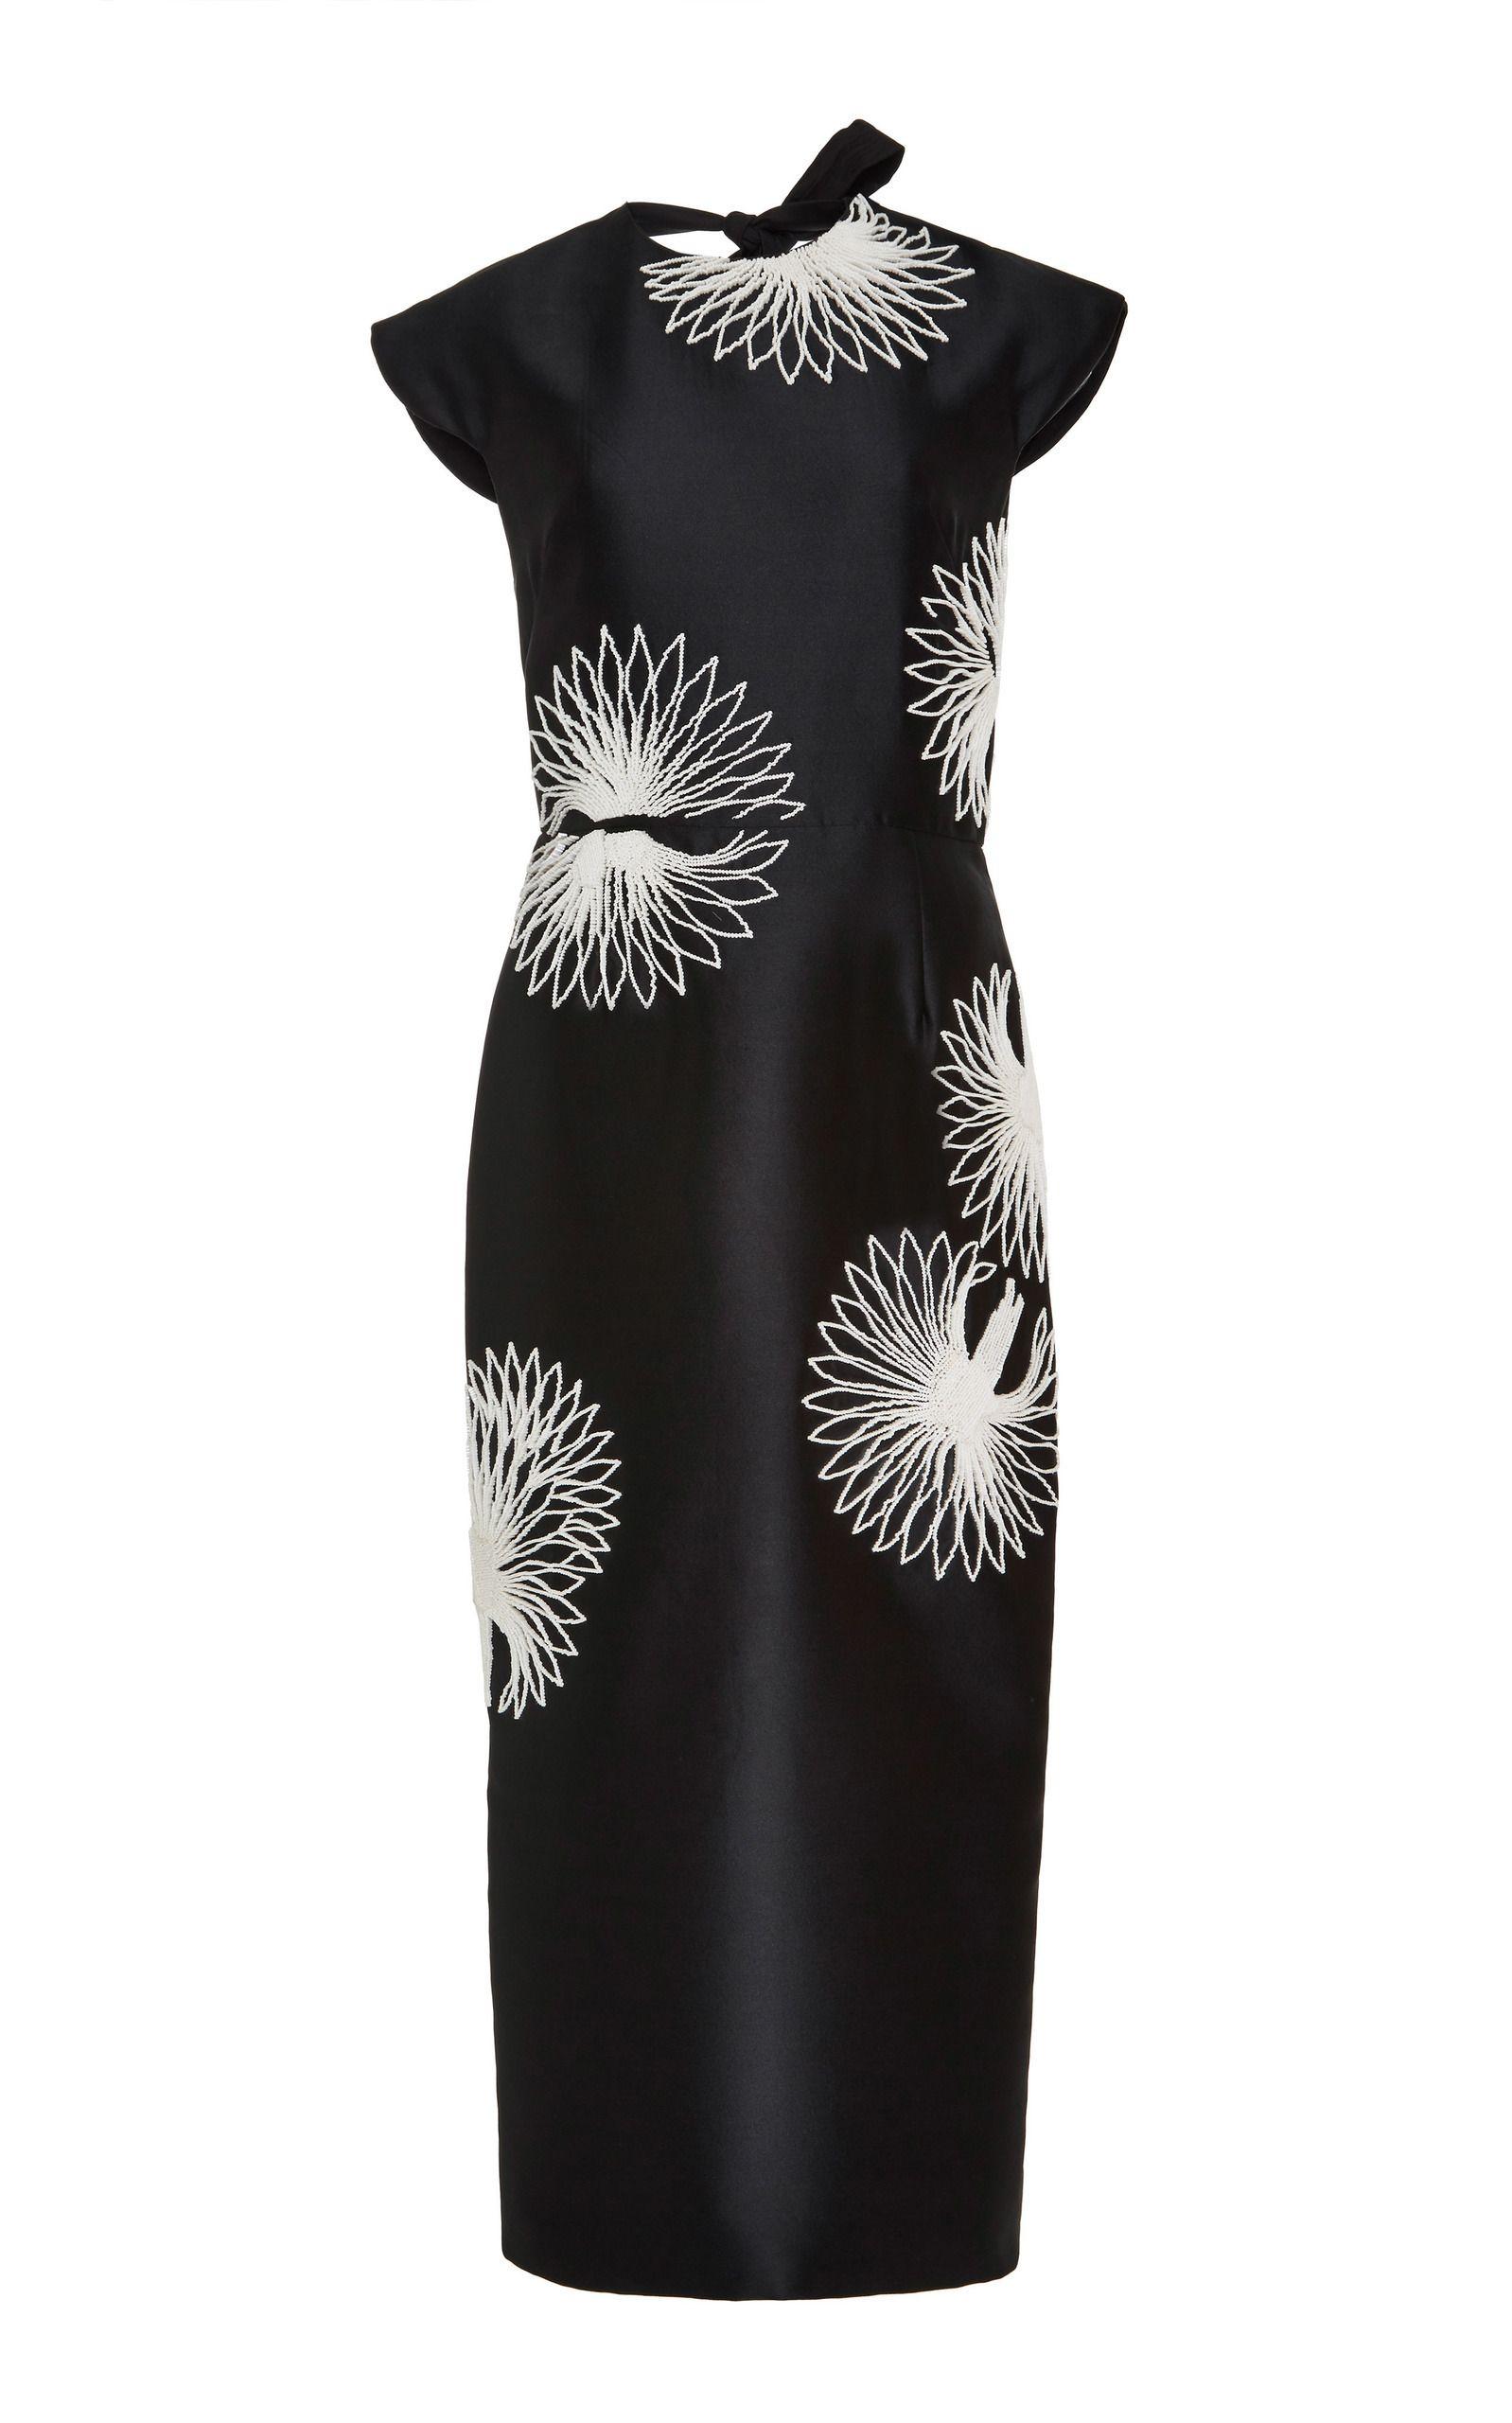 52cb51d7b2c Bugle Bead Embroidered Midi Dress by BIBHU MOHAPATRA for Preorder on Moda  Operandi